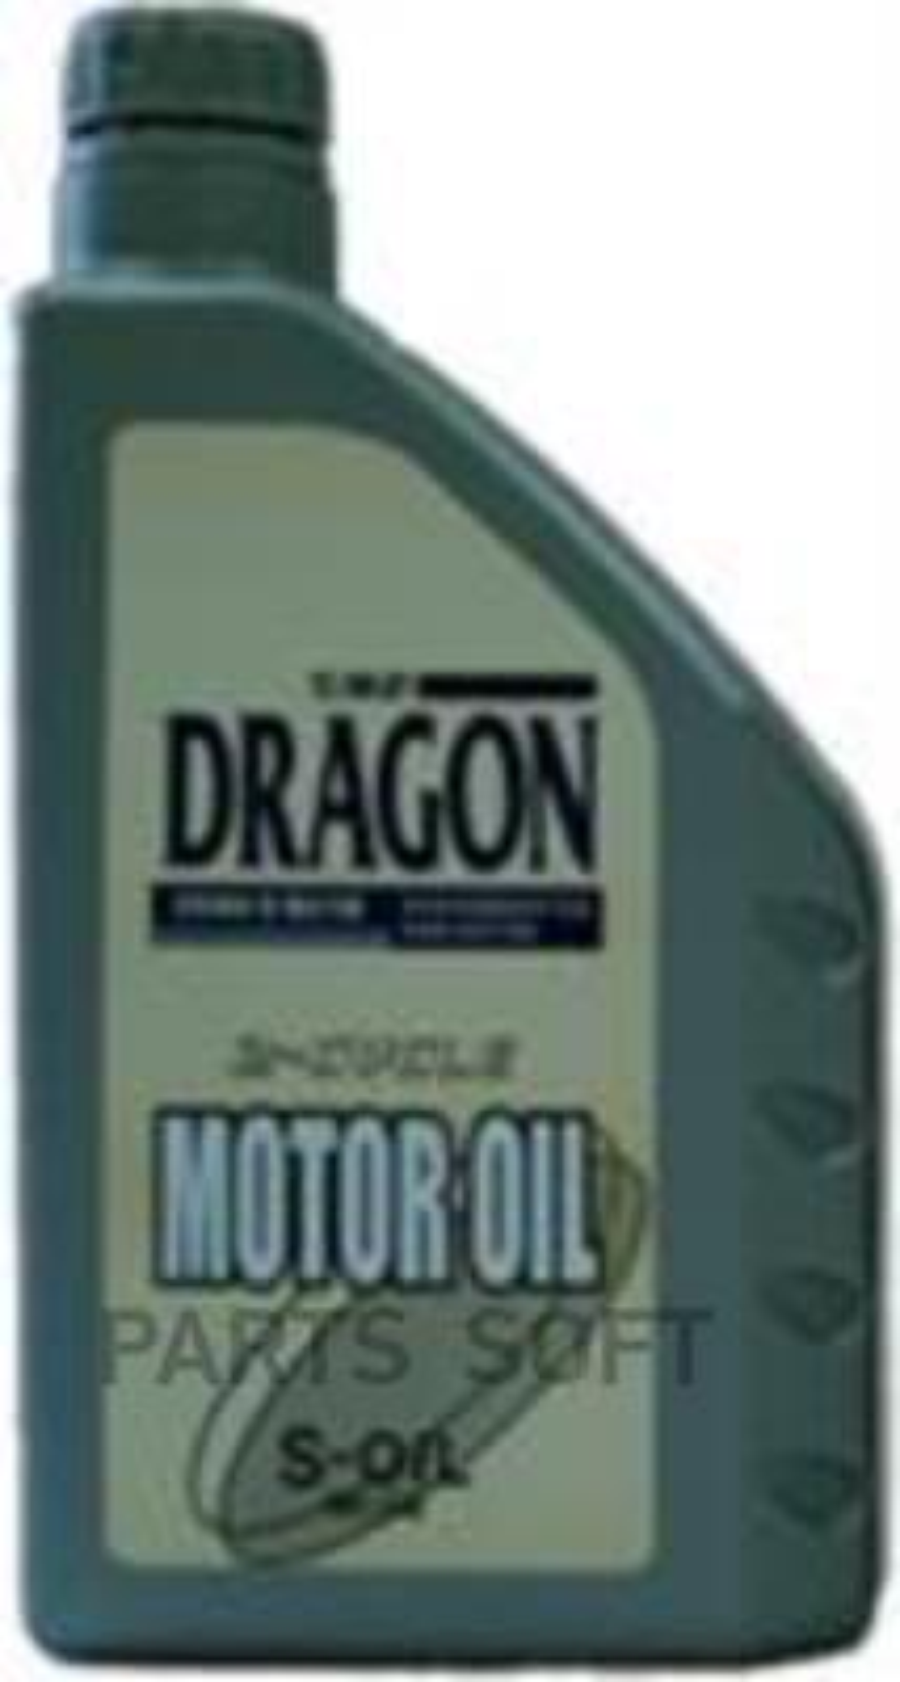 Dragon 2-CYCLE MOTOR OIL .